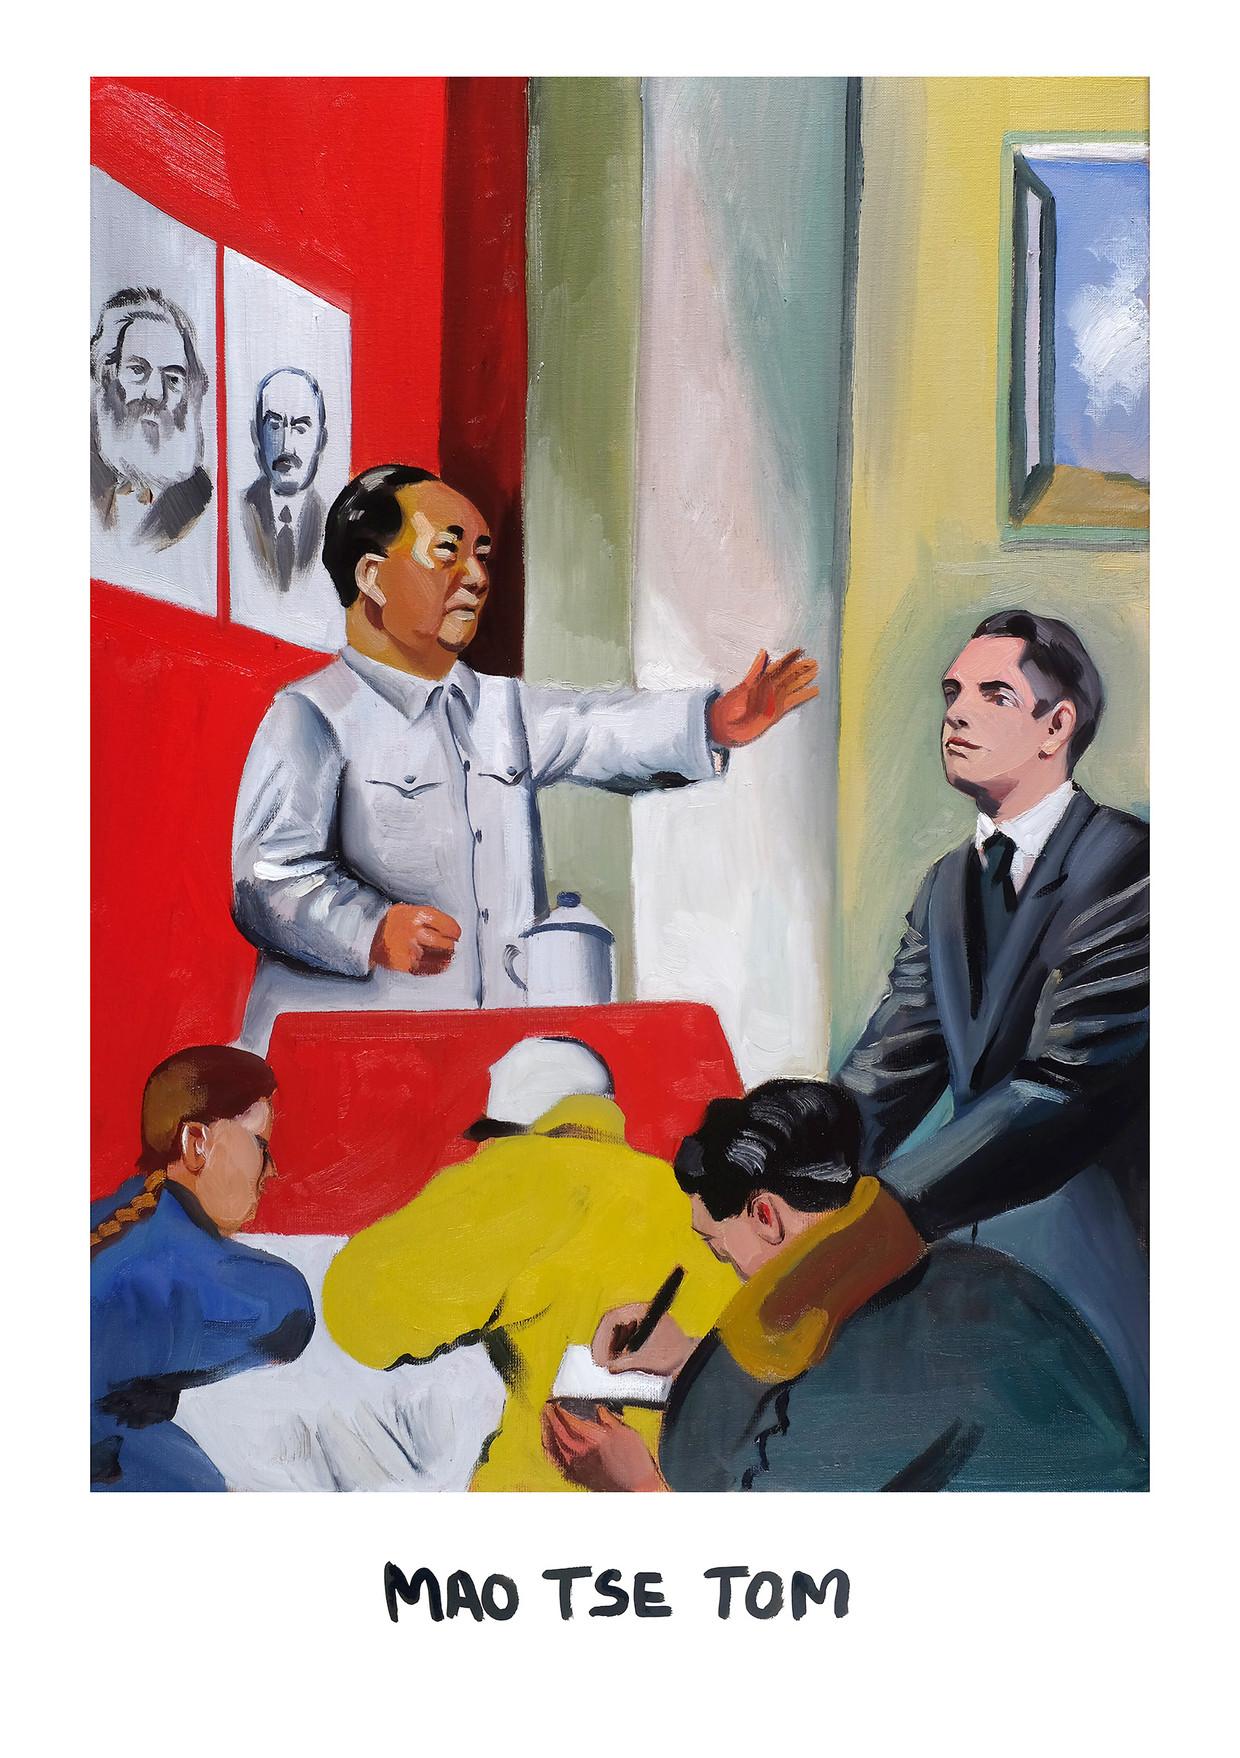 Kamaseele 36: Mao Tse Tom Beeld Kamagurka & Herr Seele